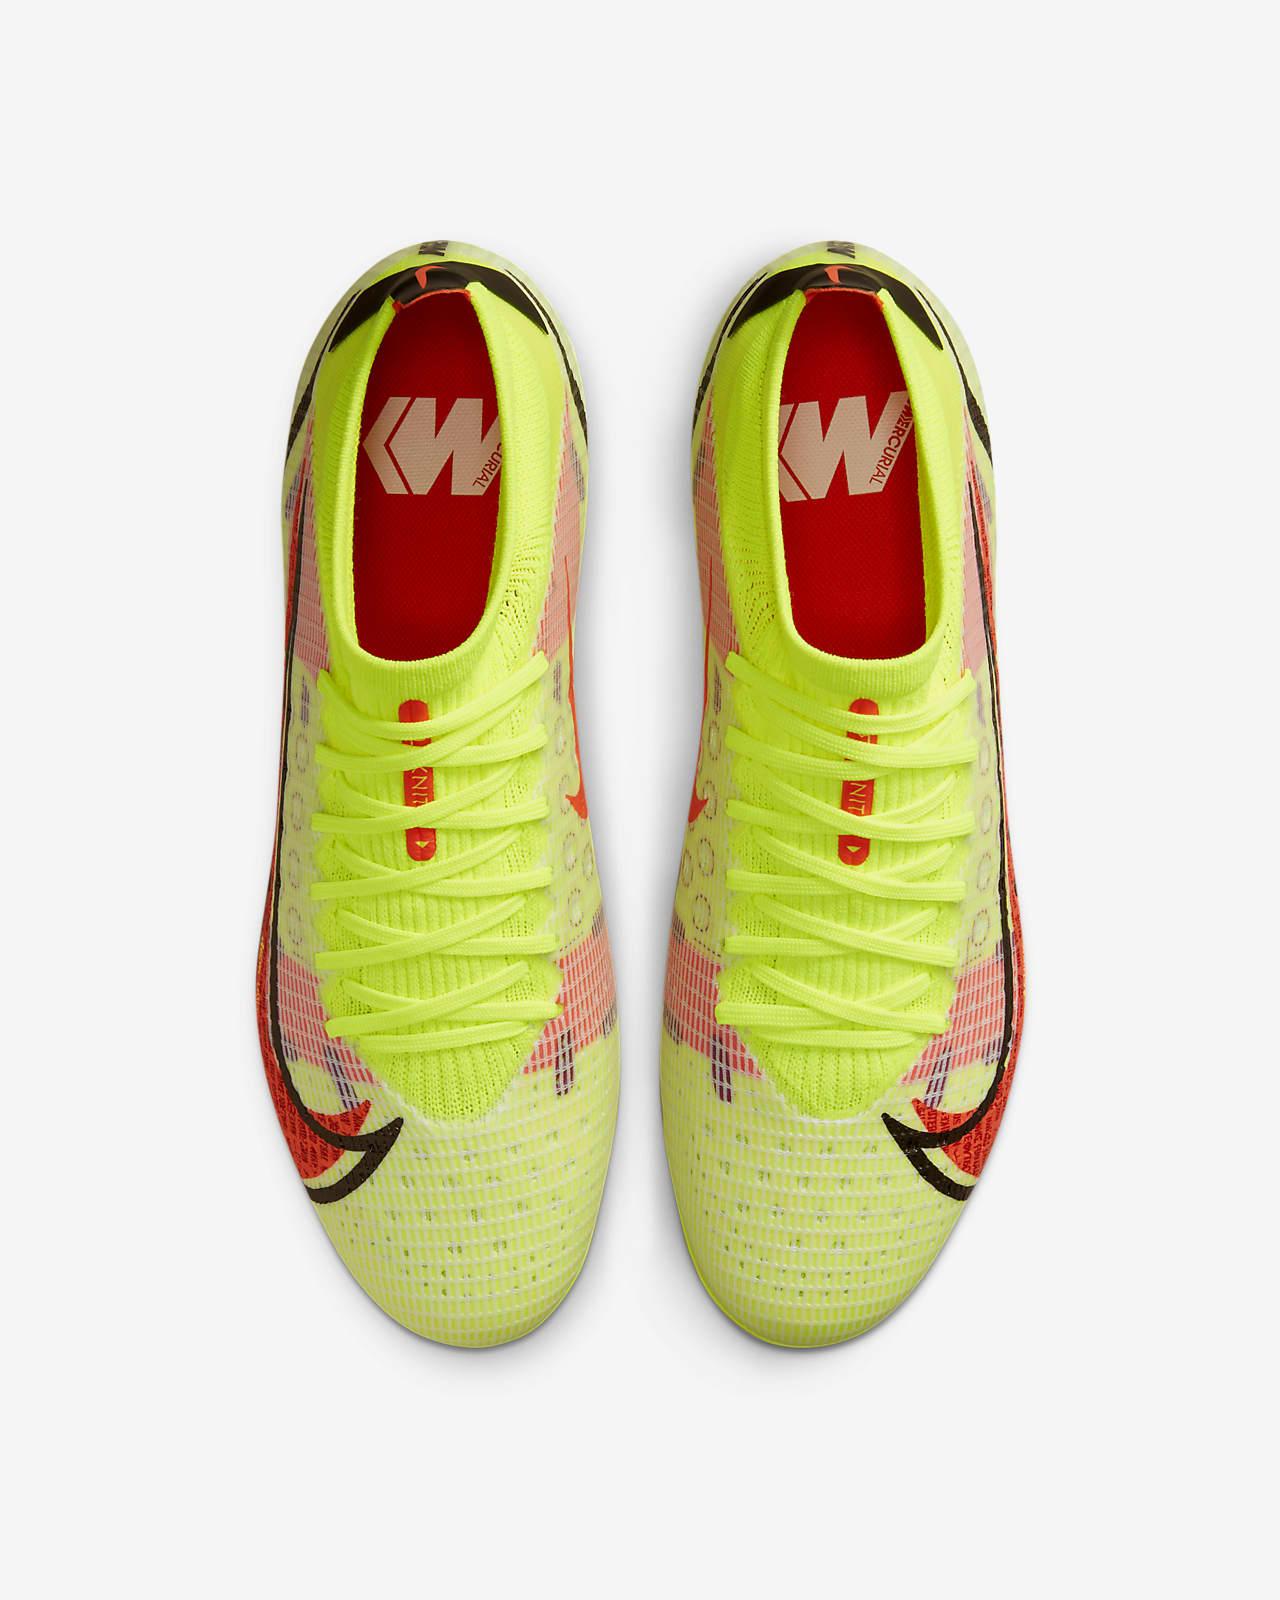 Chaussure de football à crampons pour terrain sec Nike Mercurial ...